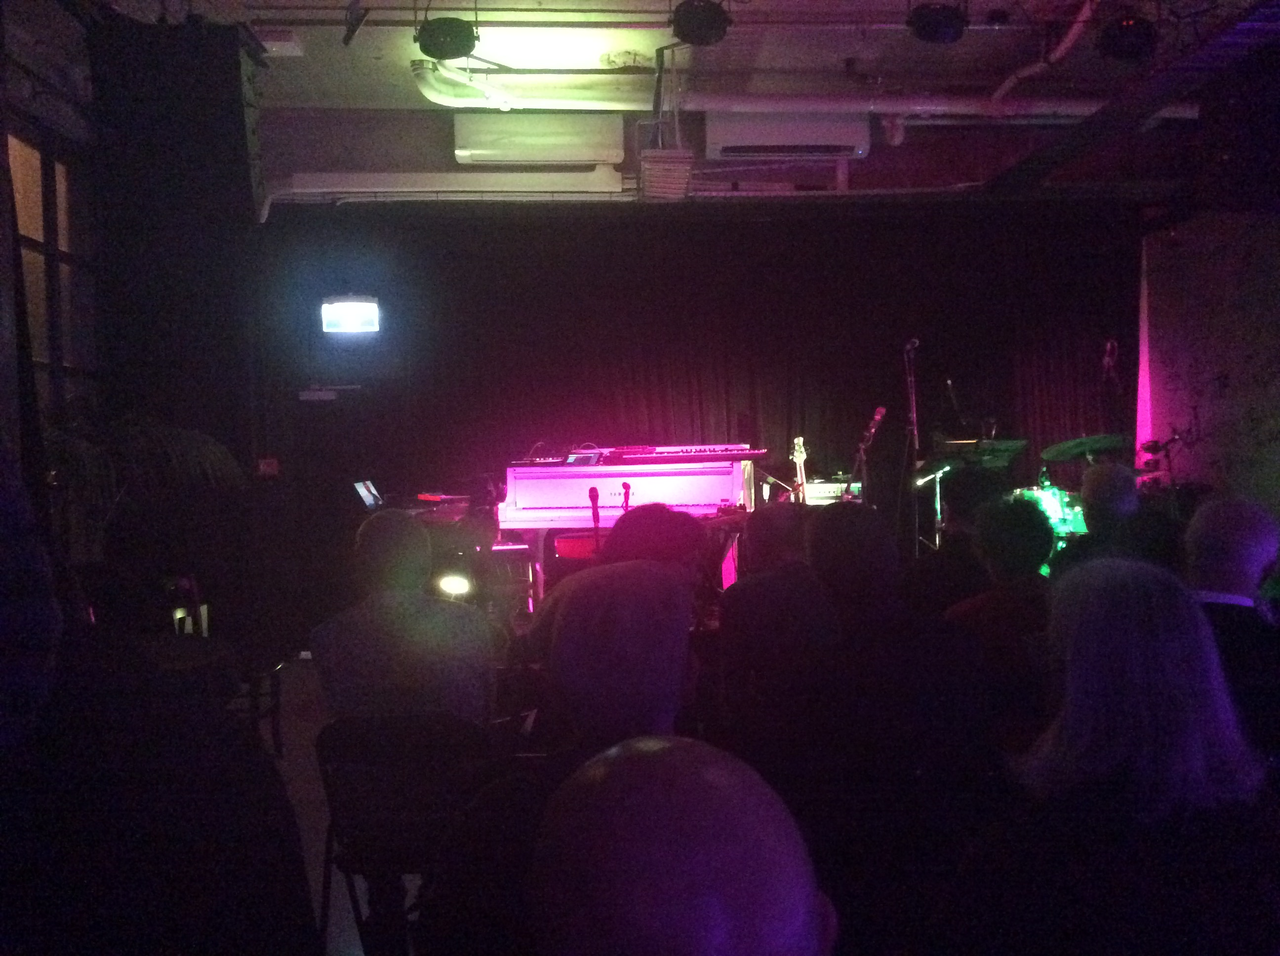 Joyful Noise: Deep Dives Into Music From Aotearoa/New Zealand